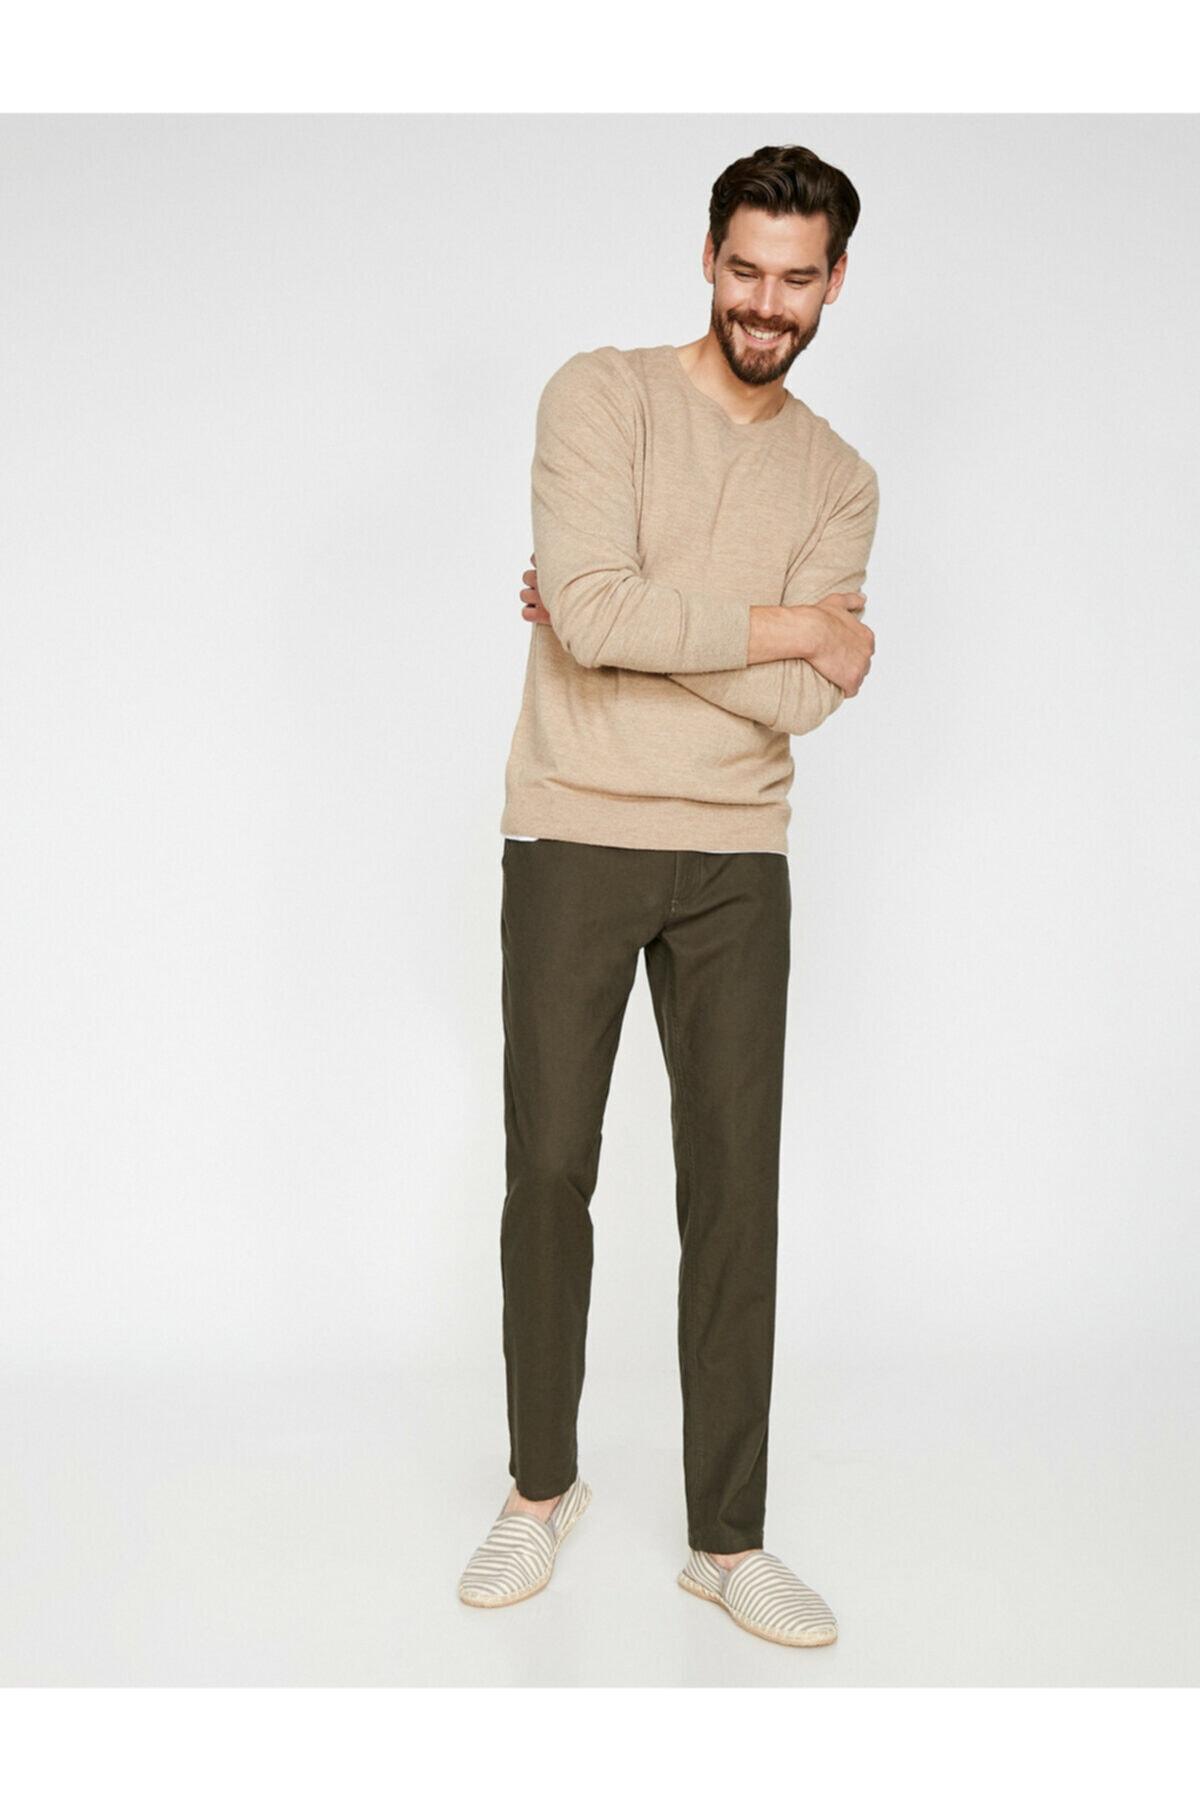 Koton Erkek Yeşil Cep Detayli Pantolon 9YAM41992BW 1